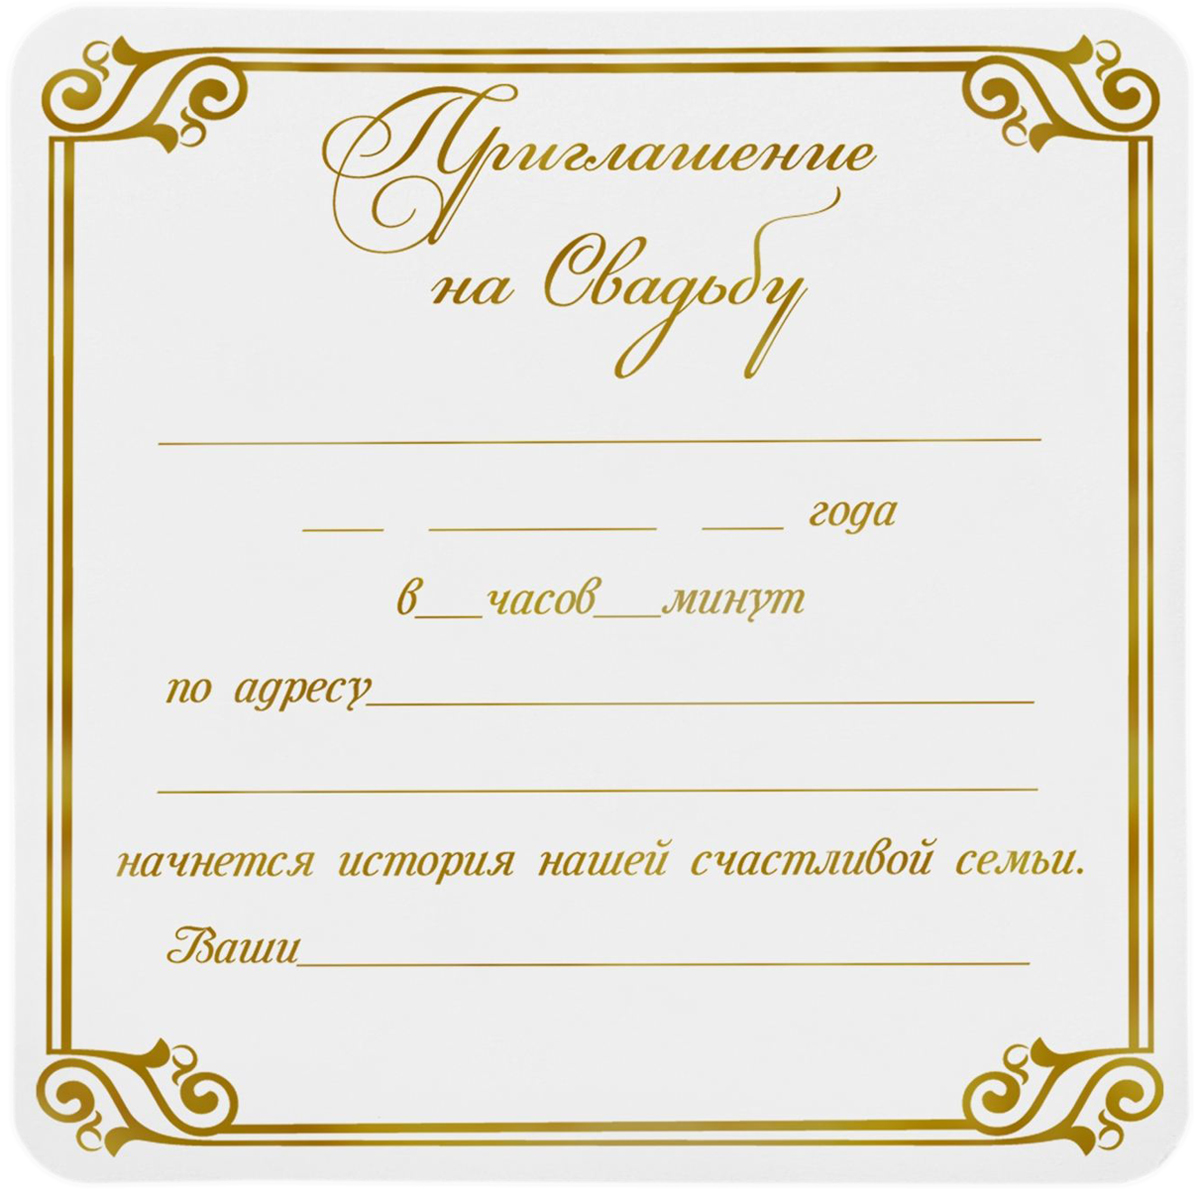 Приглашение бланк картинки